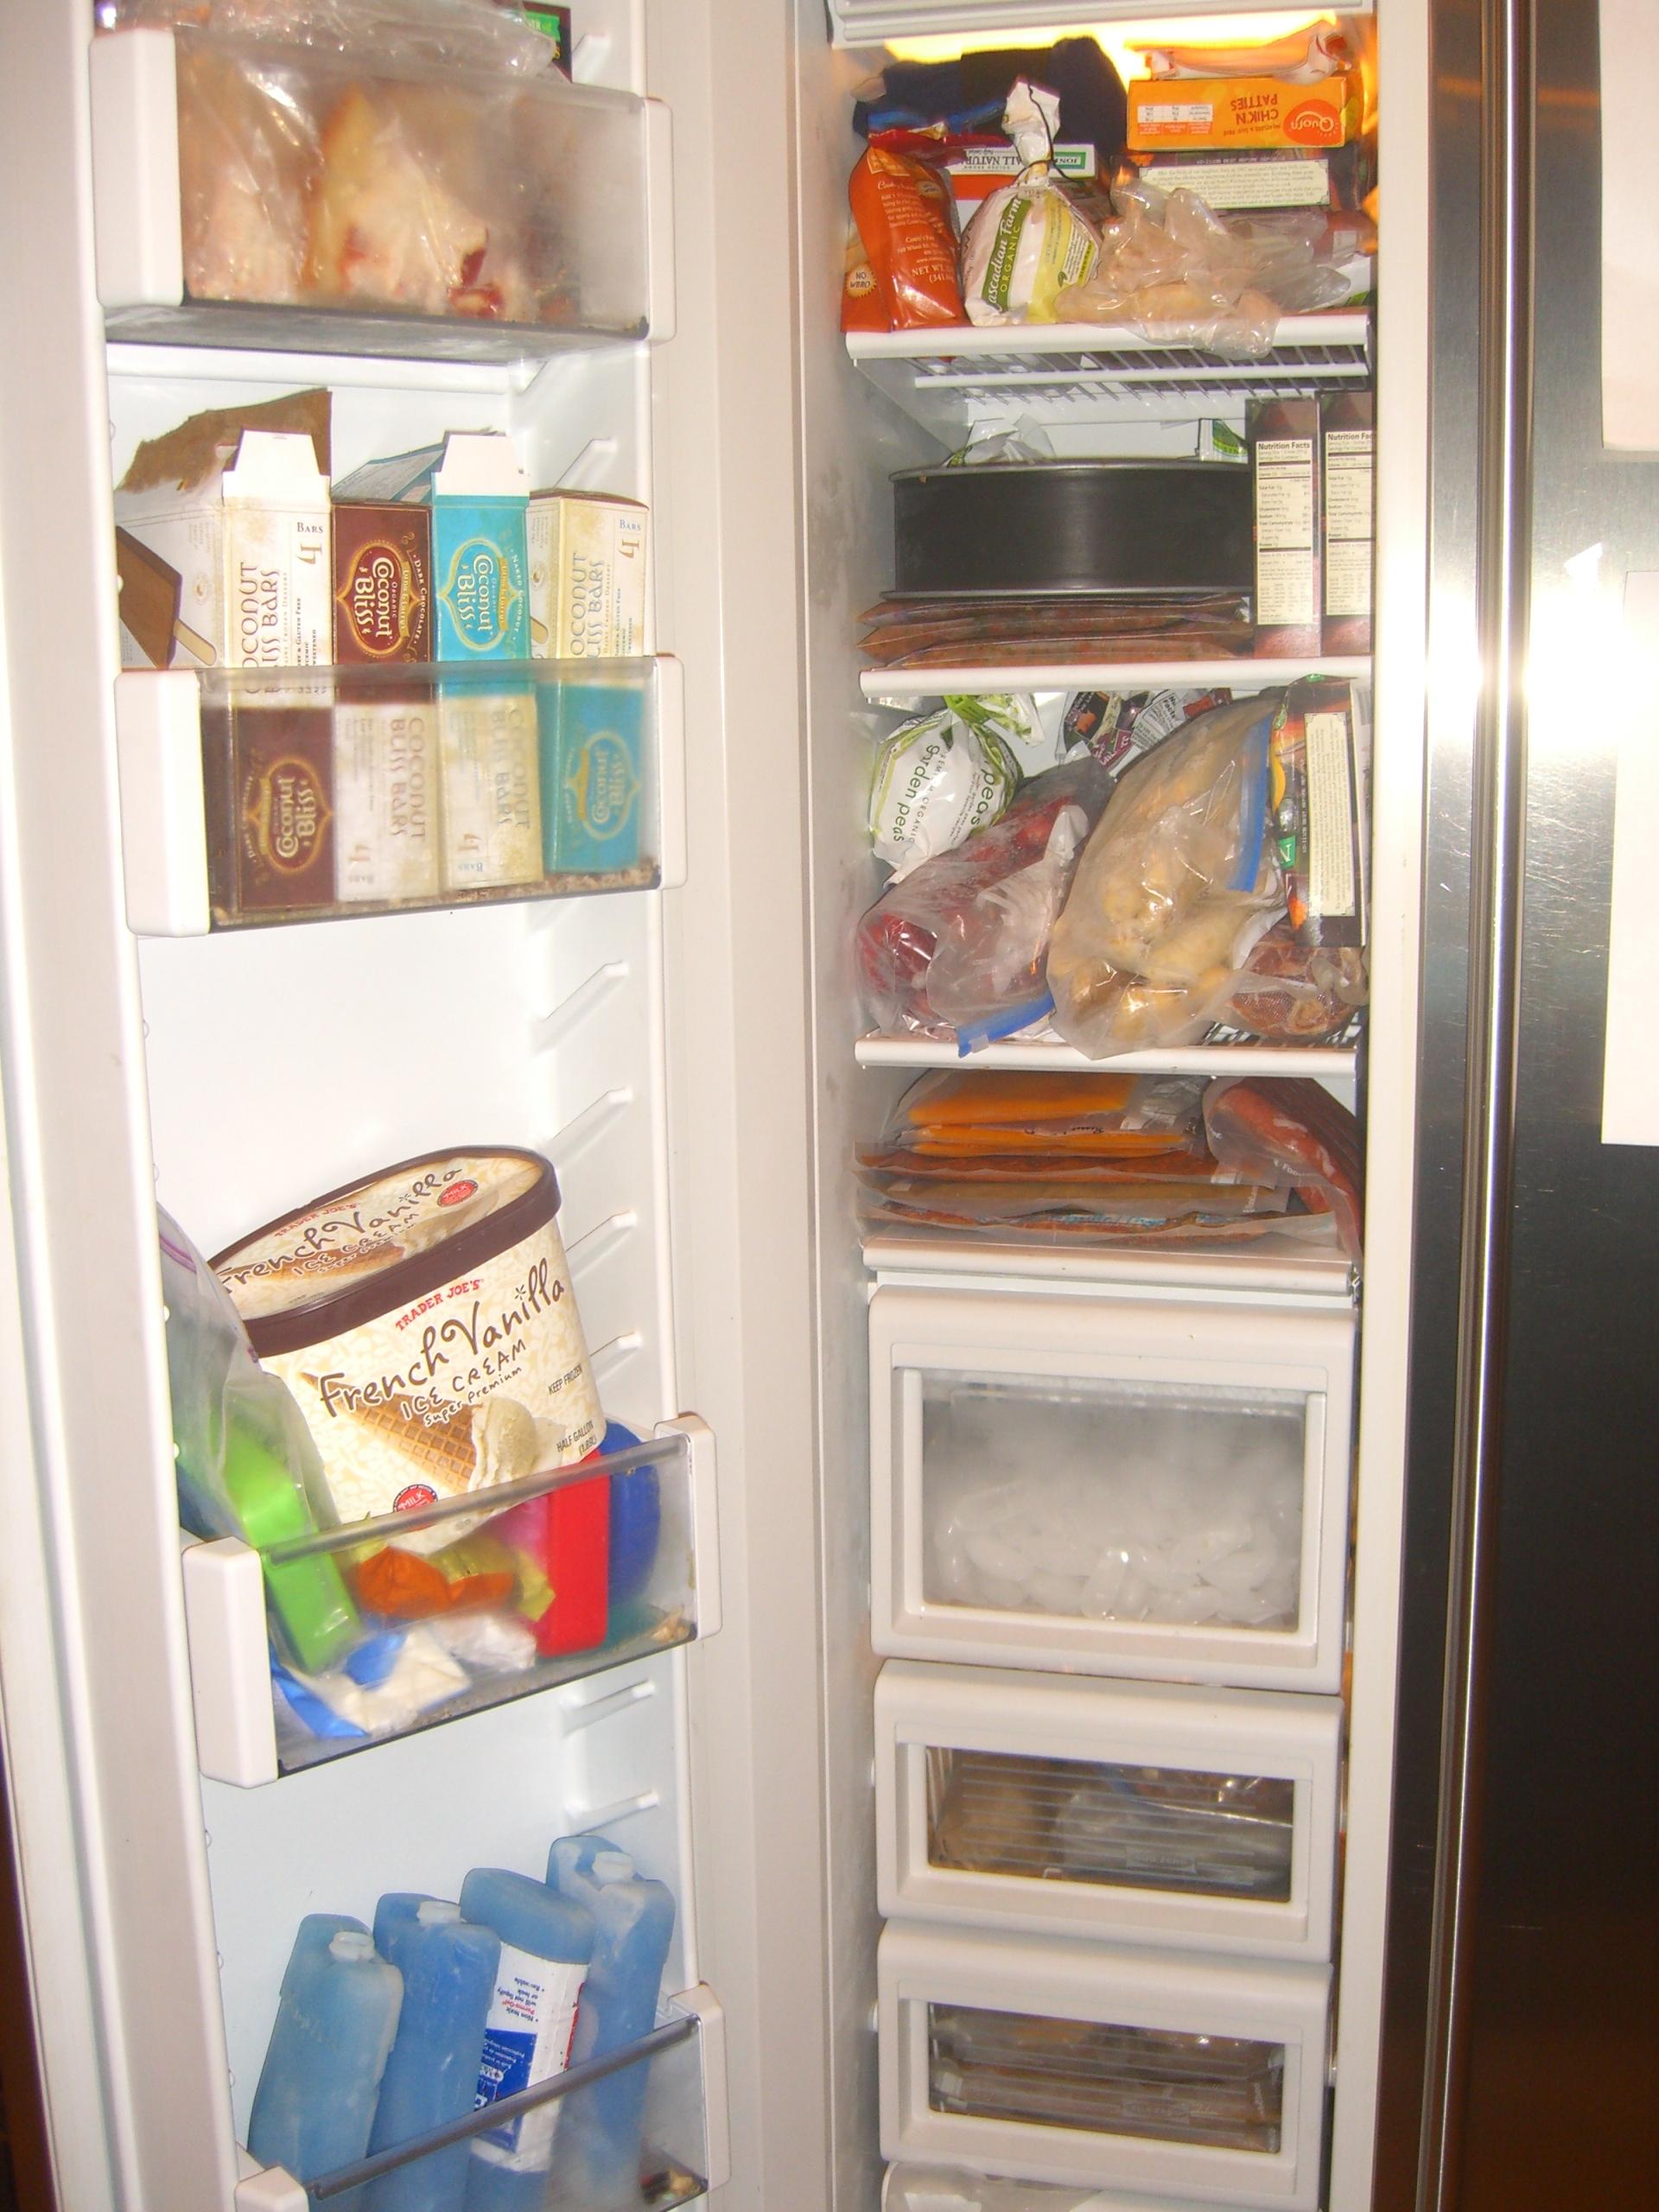 Freezer BEFORE